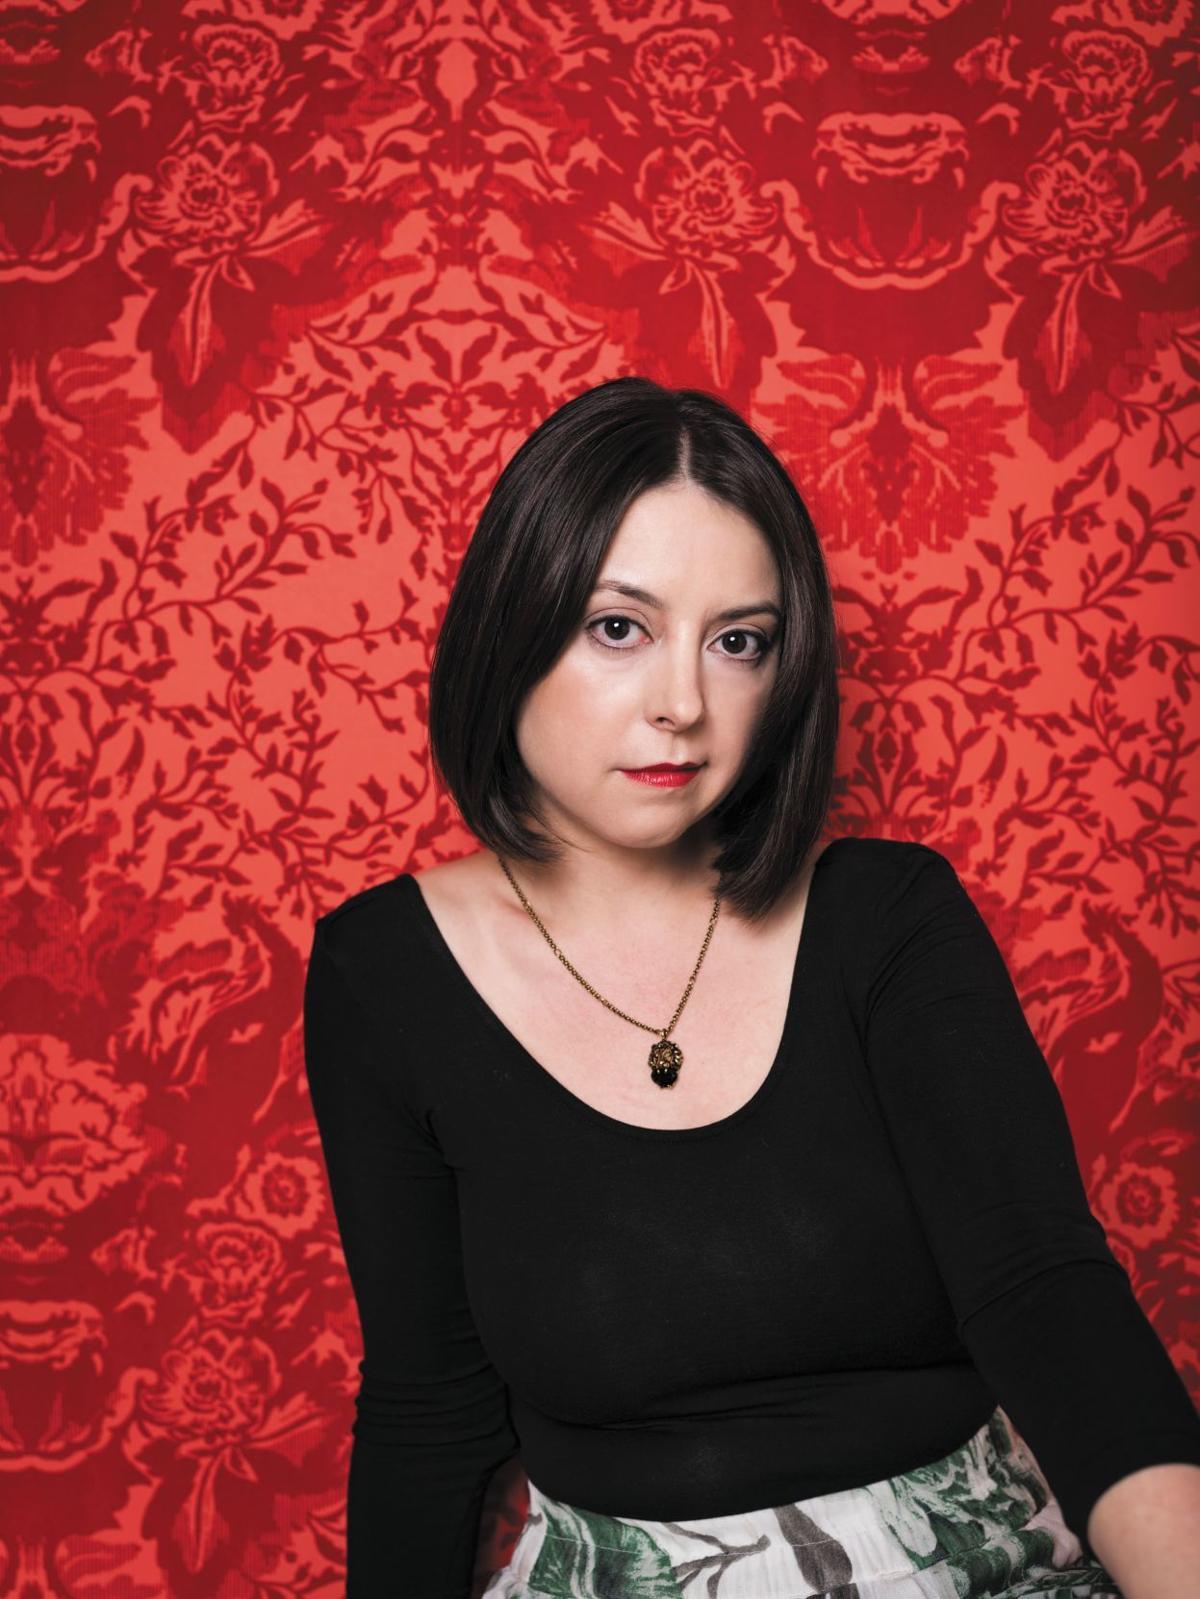 Podcast 'star' and author Karina Longworth